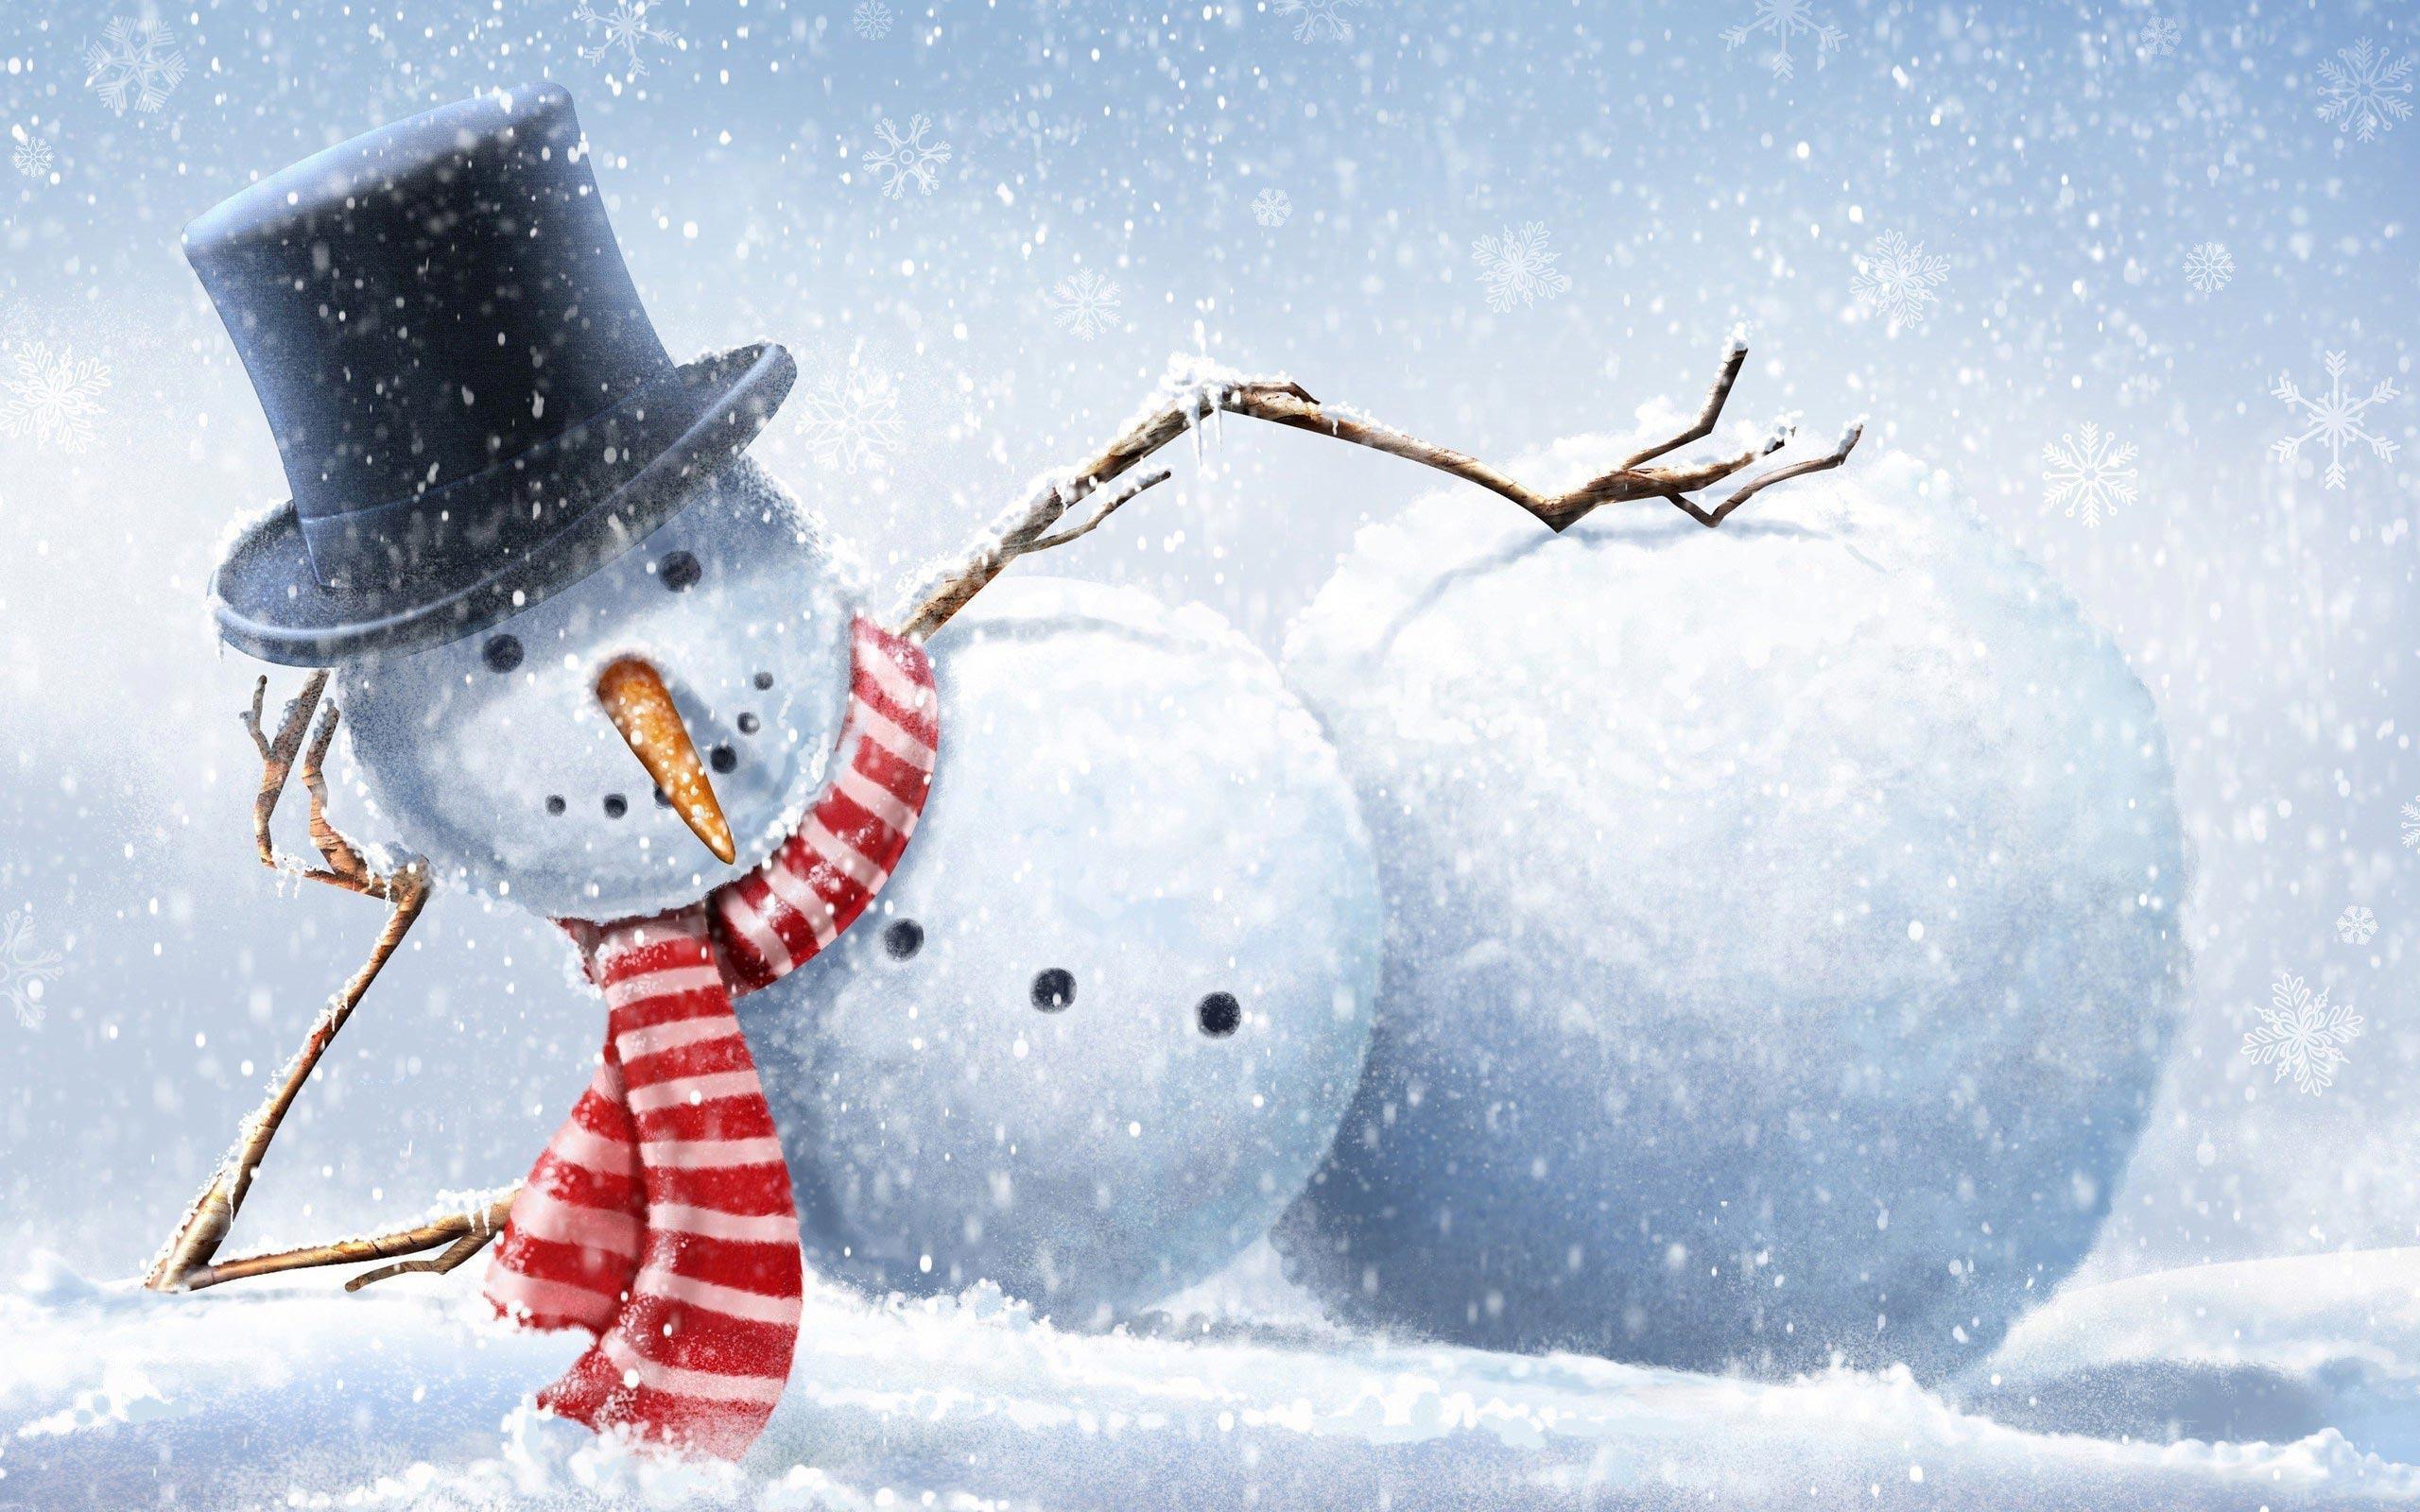 Snowman Backgrounds - WallpaperSafari